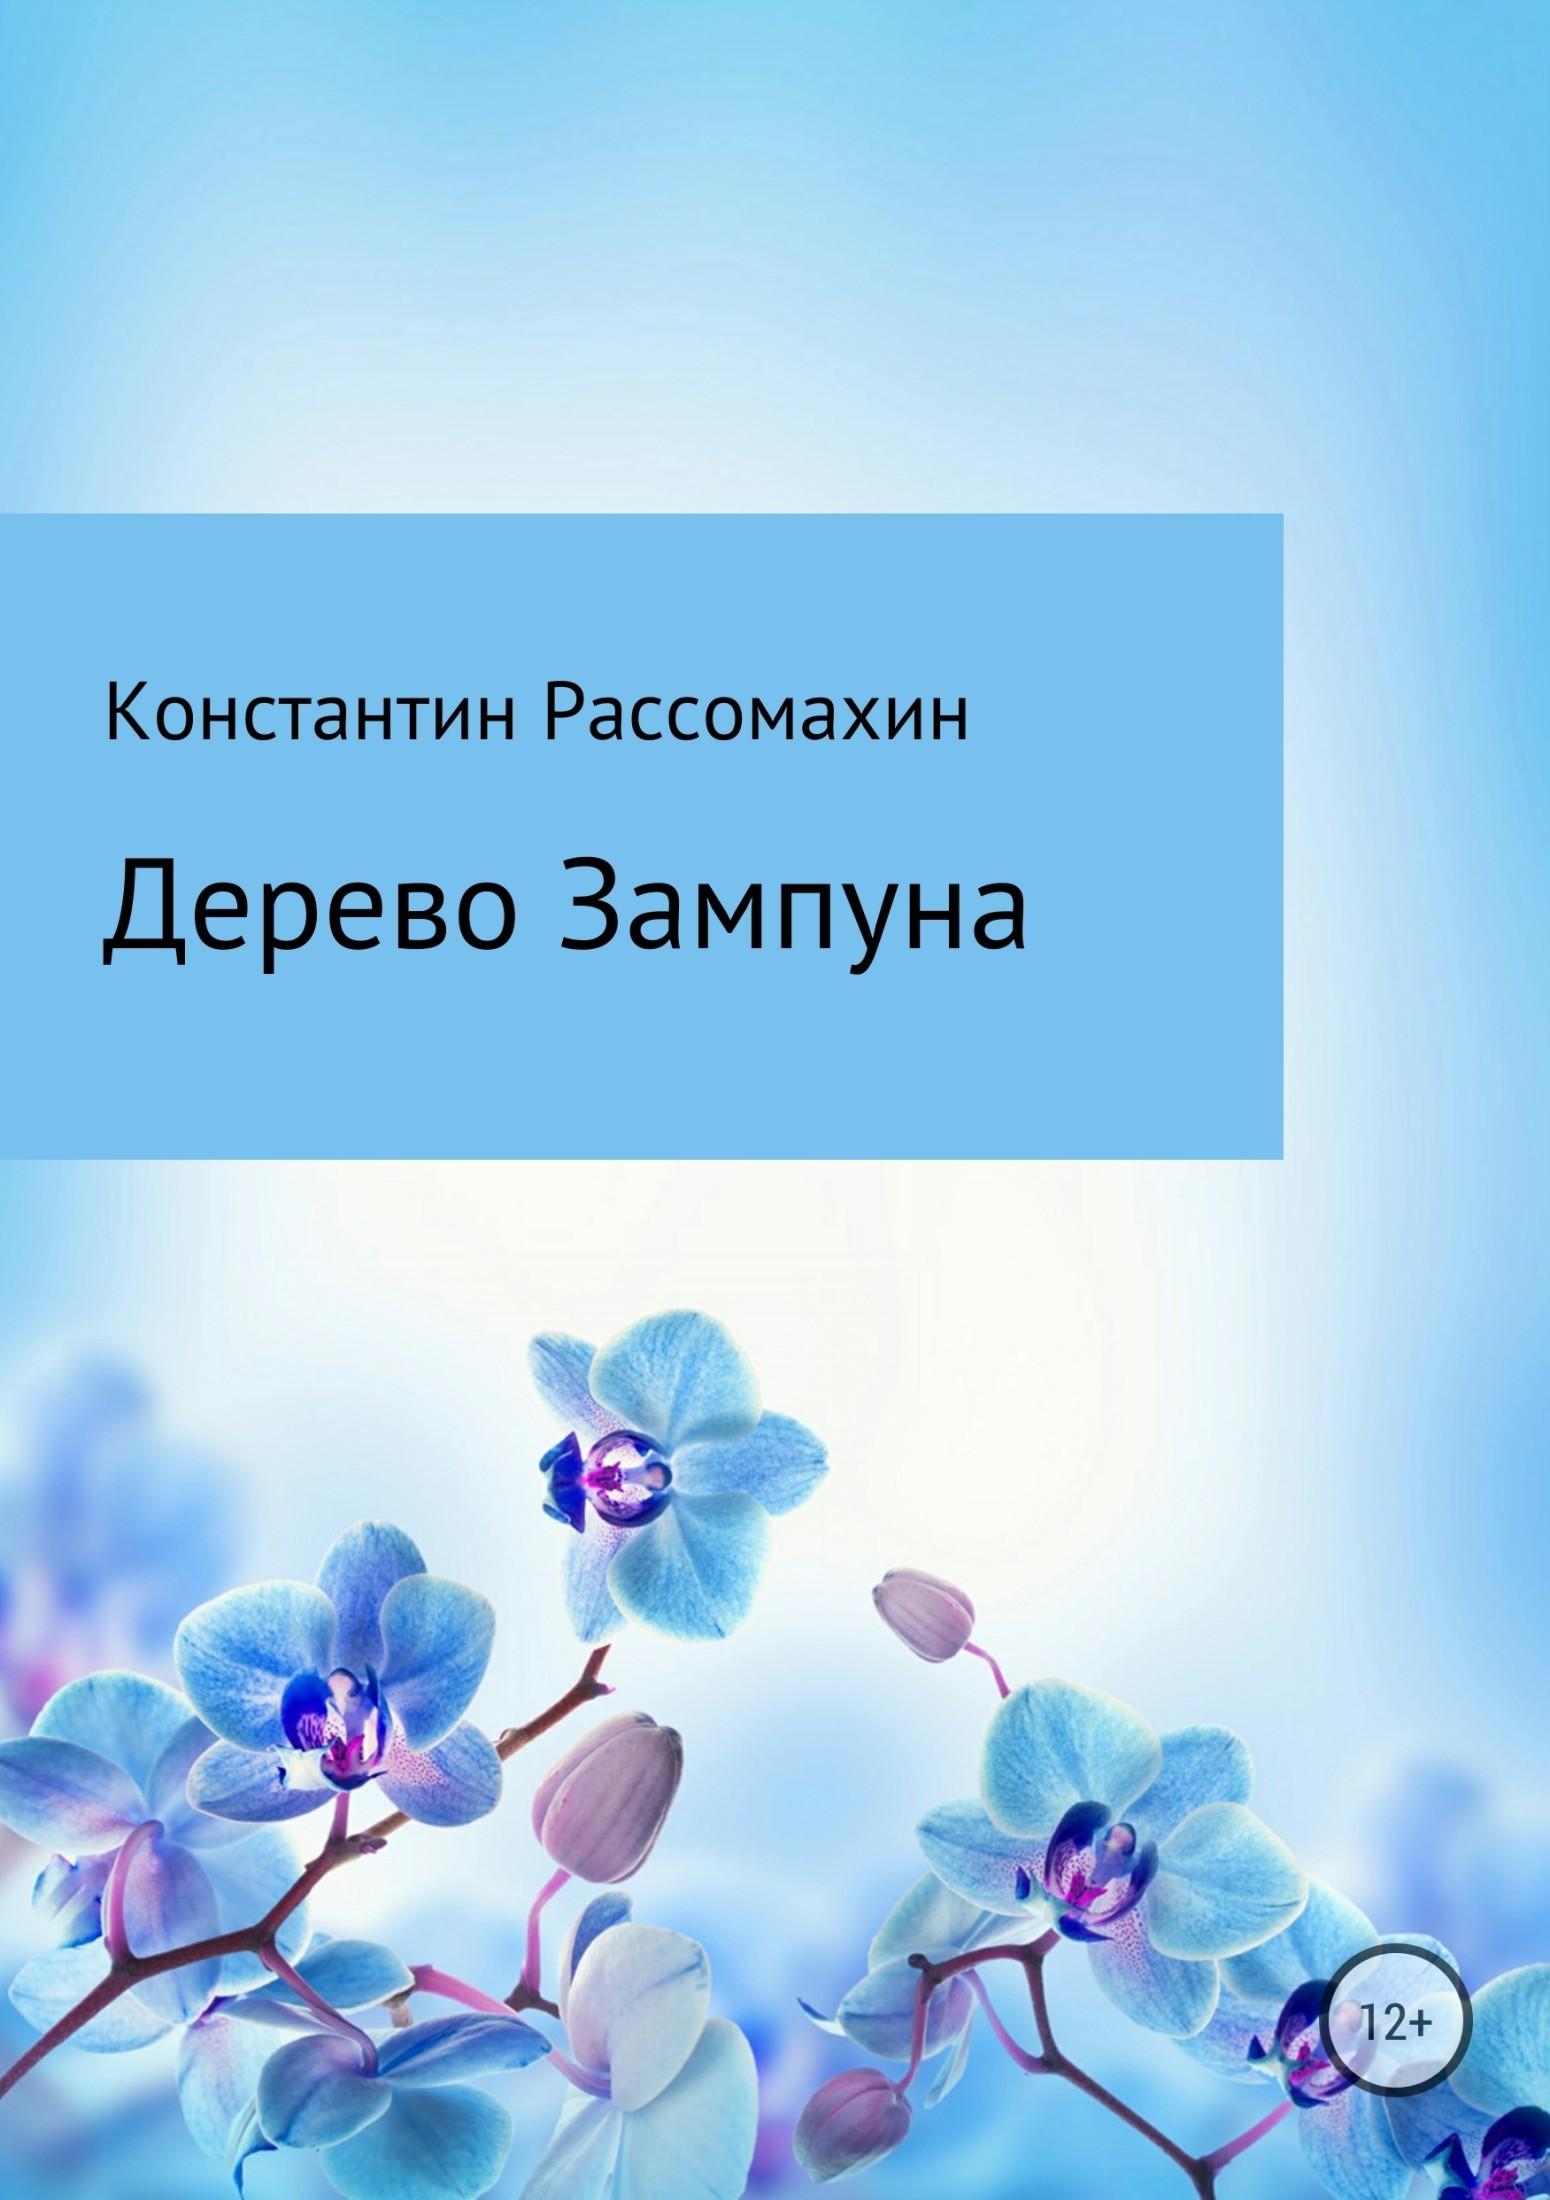 Константин Рассомахин Дерево Зампуна